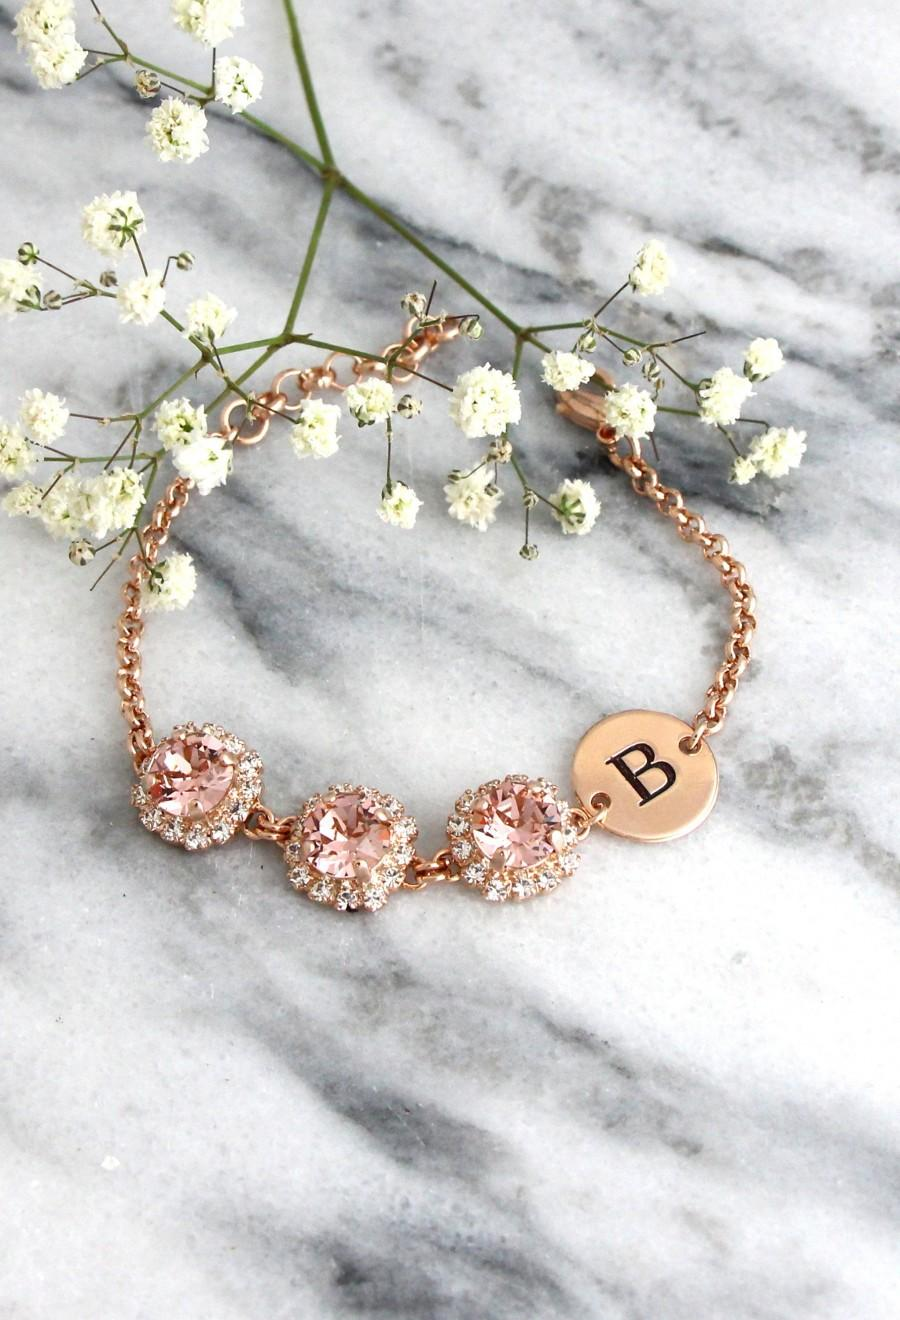 Wedding - Blush Bridesmaids Bracelet, Bridal Bracelet, Personalized Bracelet, Personalized Bridal Bracelet, Swarovski Crystal Bracelet, Letter Jewelry